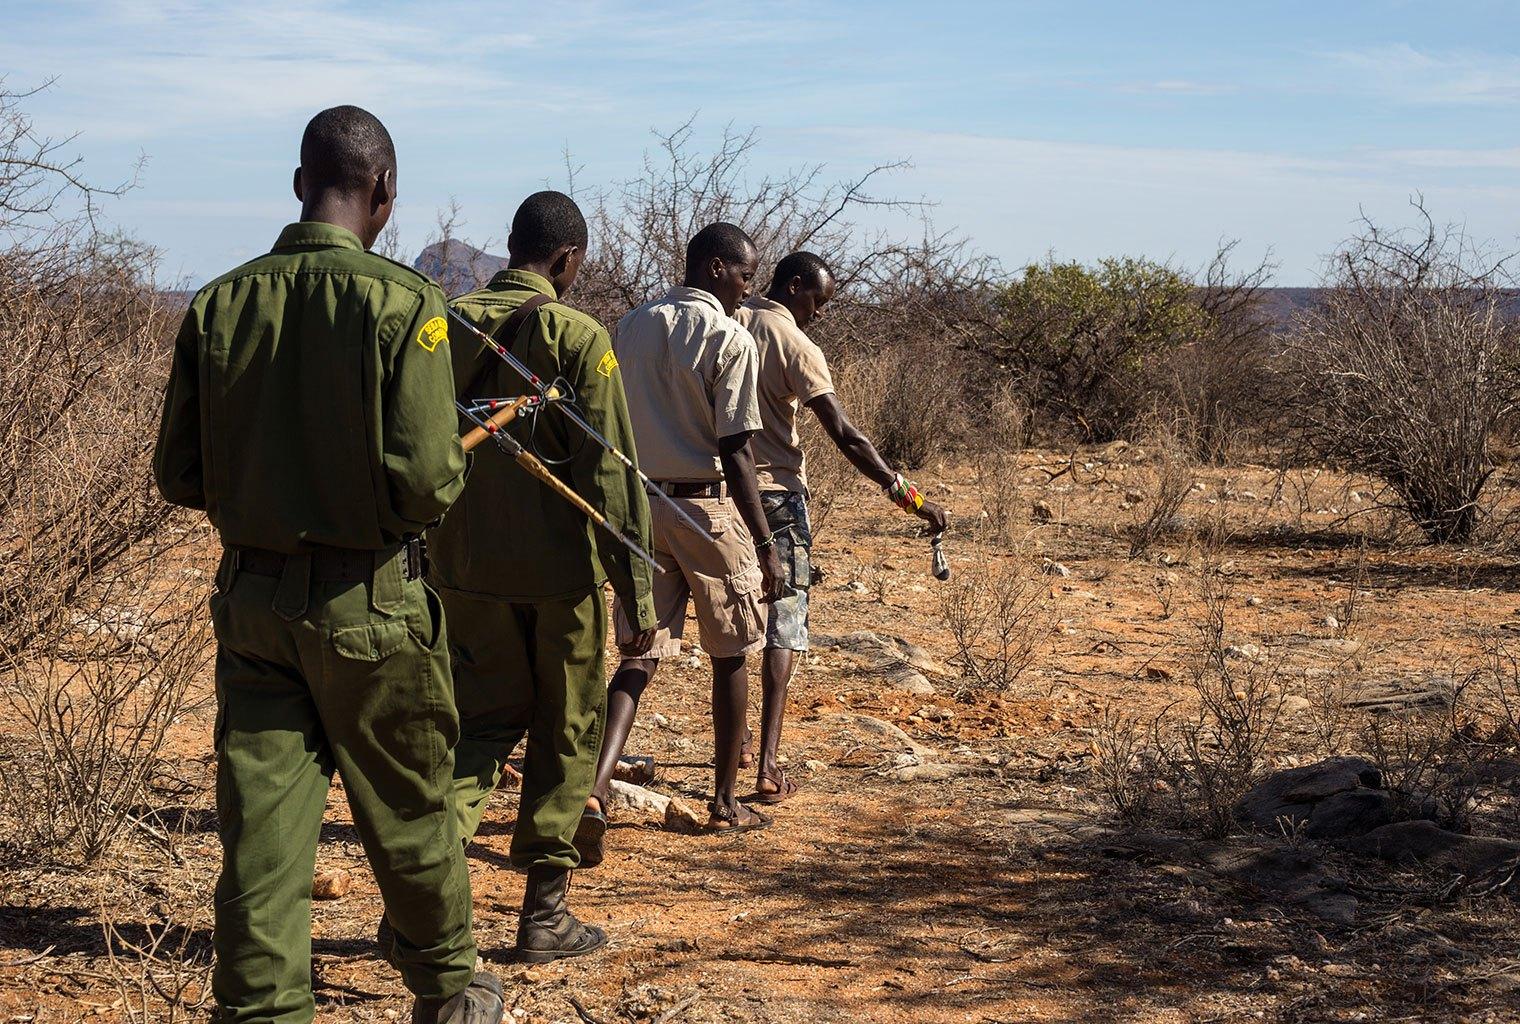 Rhino Tracking Kenya Conservation Journey 2017